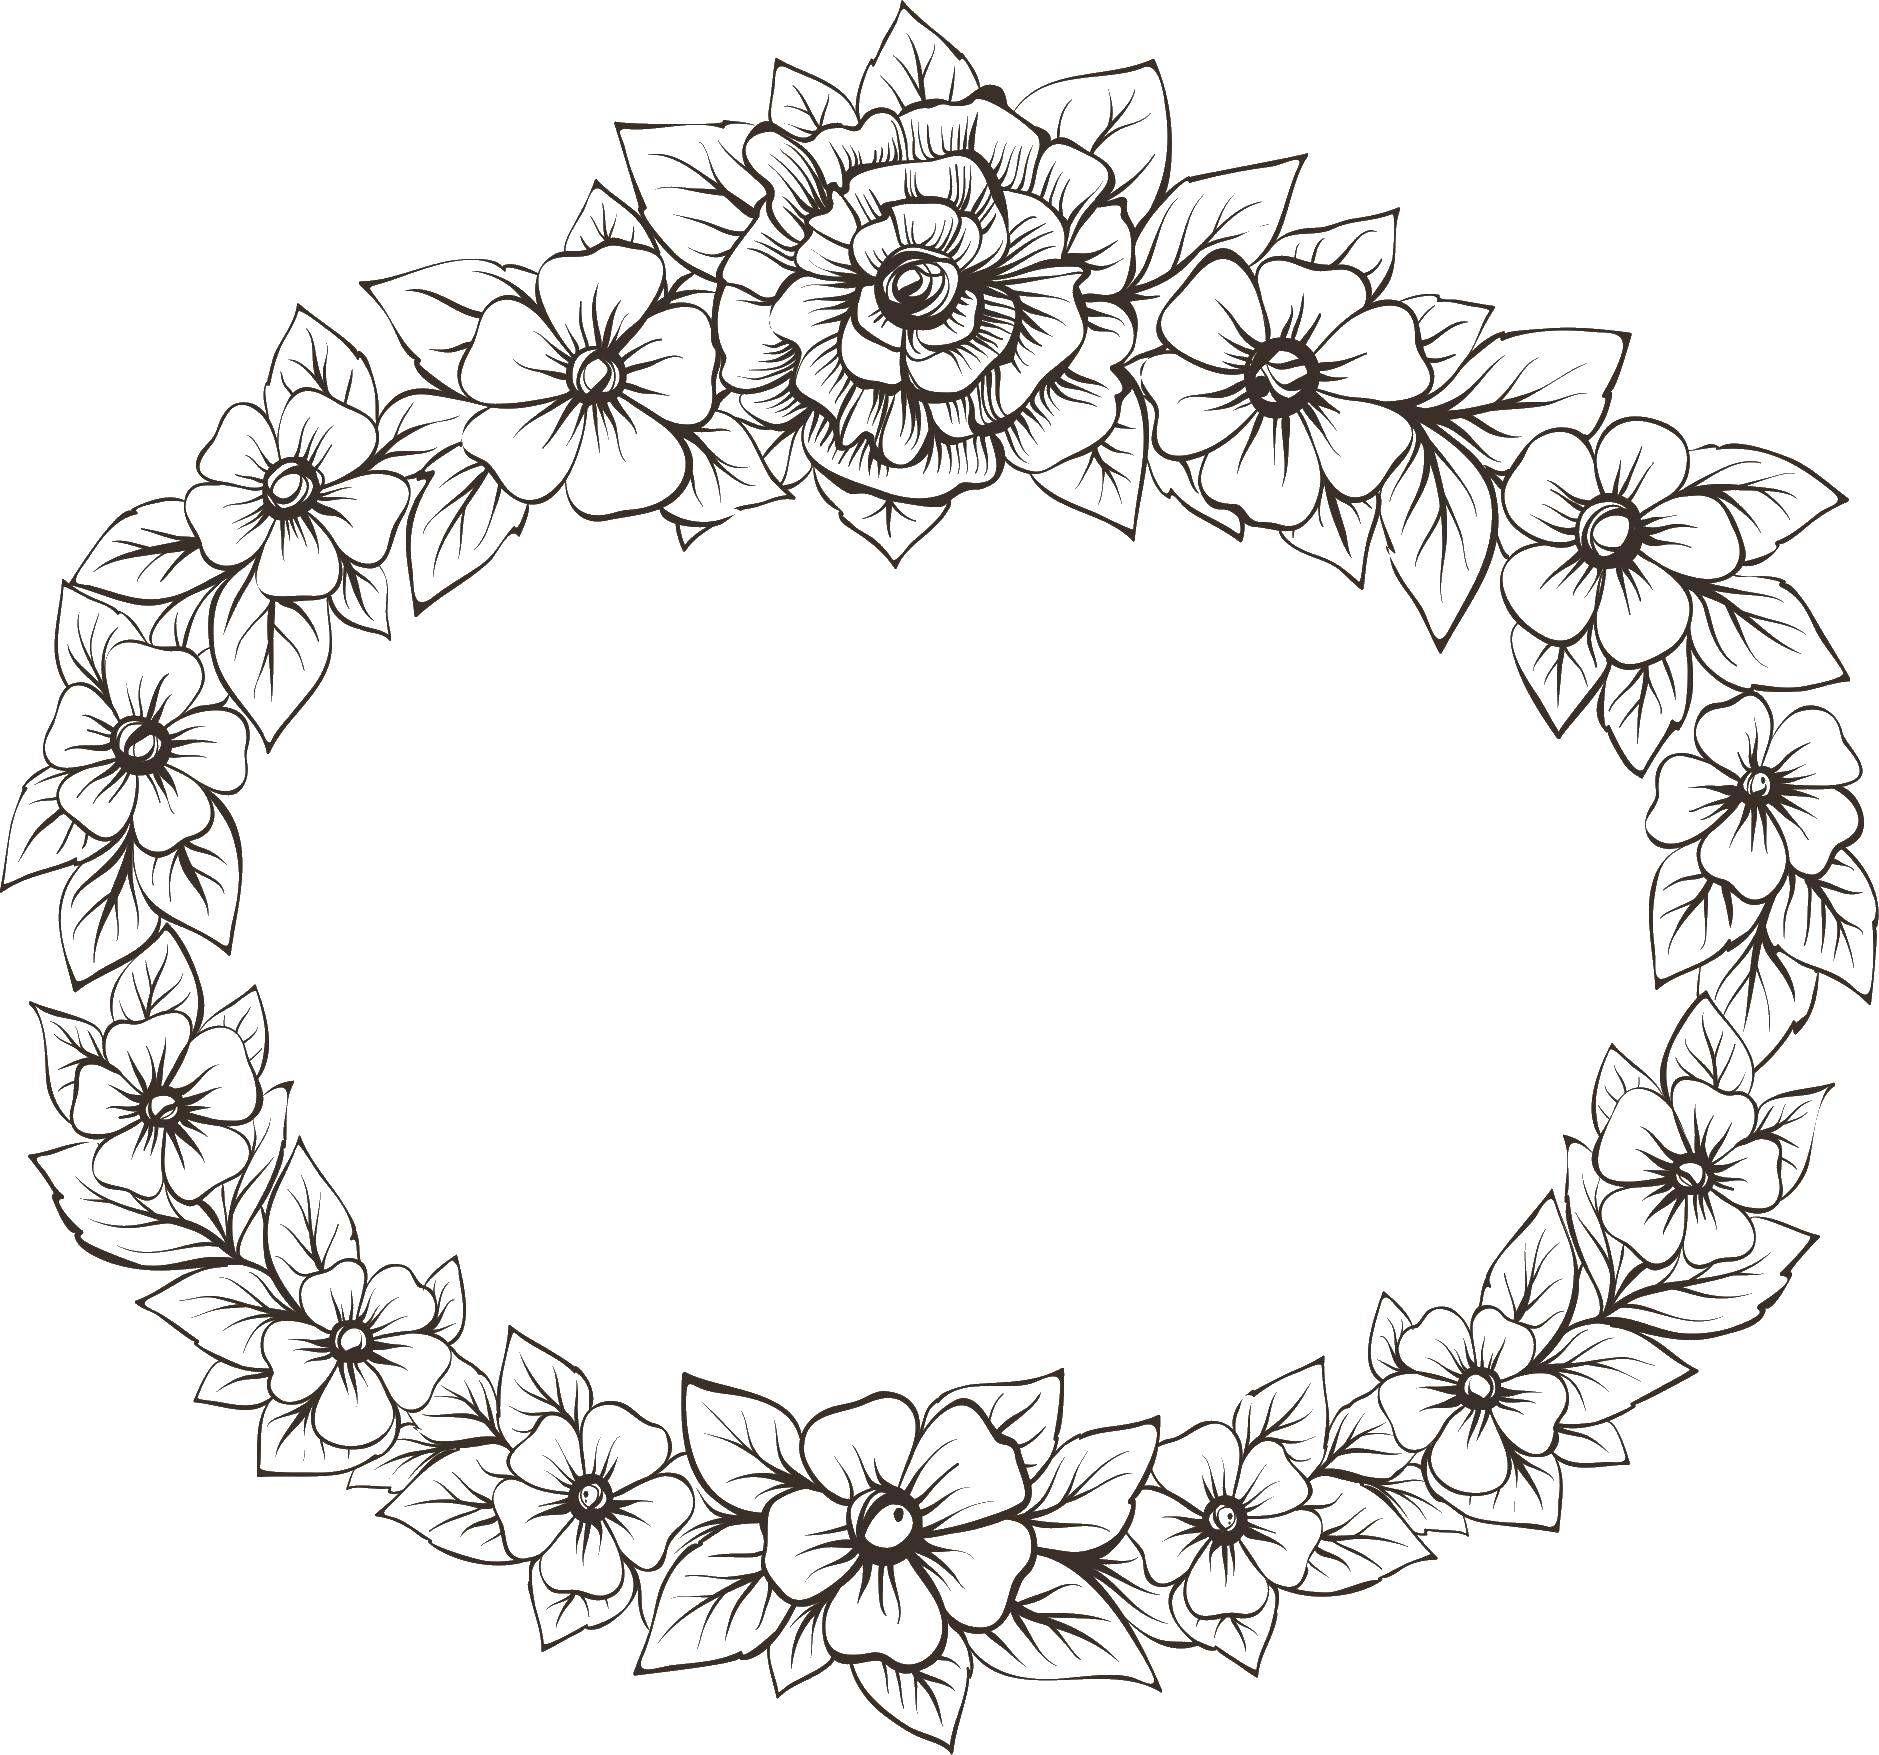 Похожее изображение embroidery pinterest embroidery wood